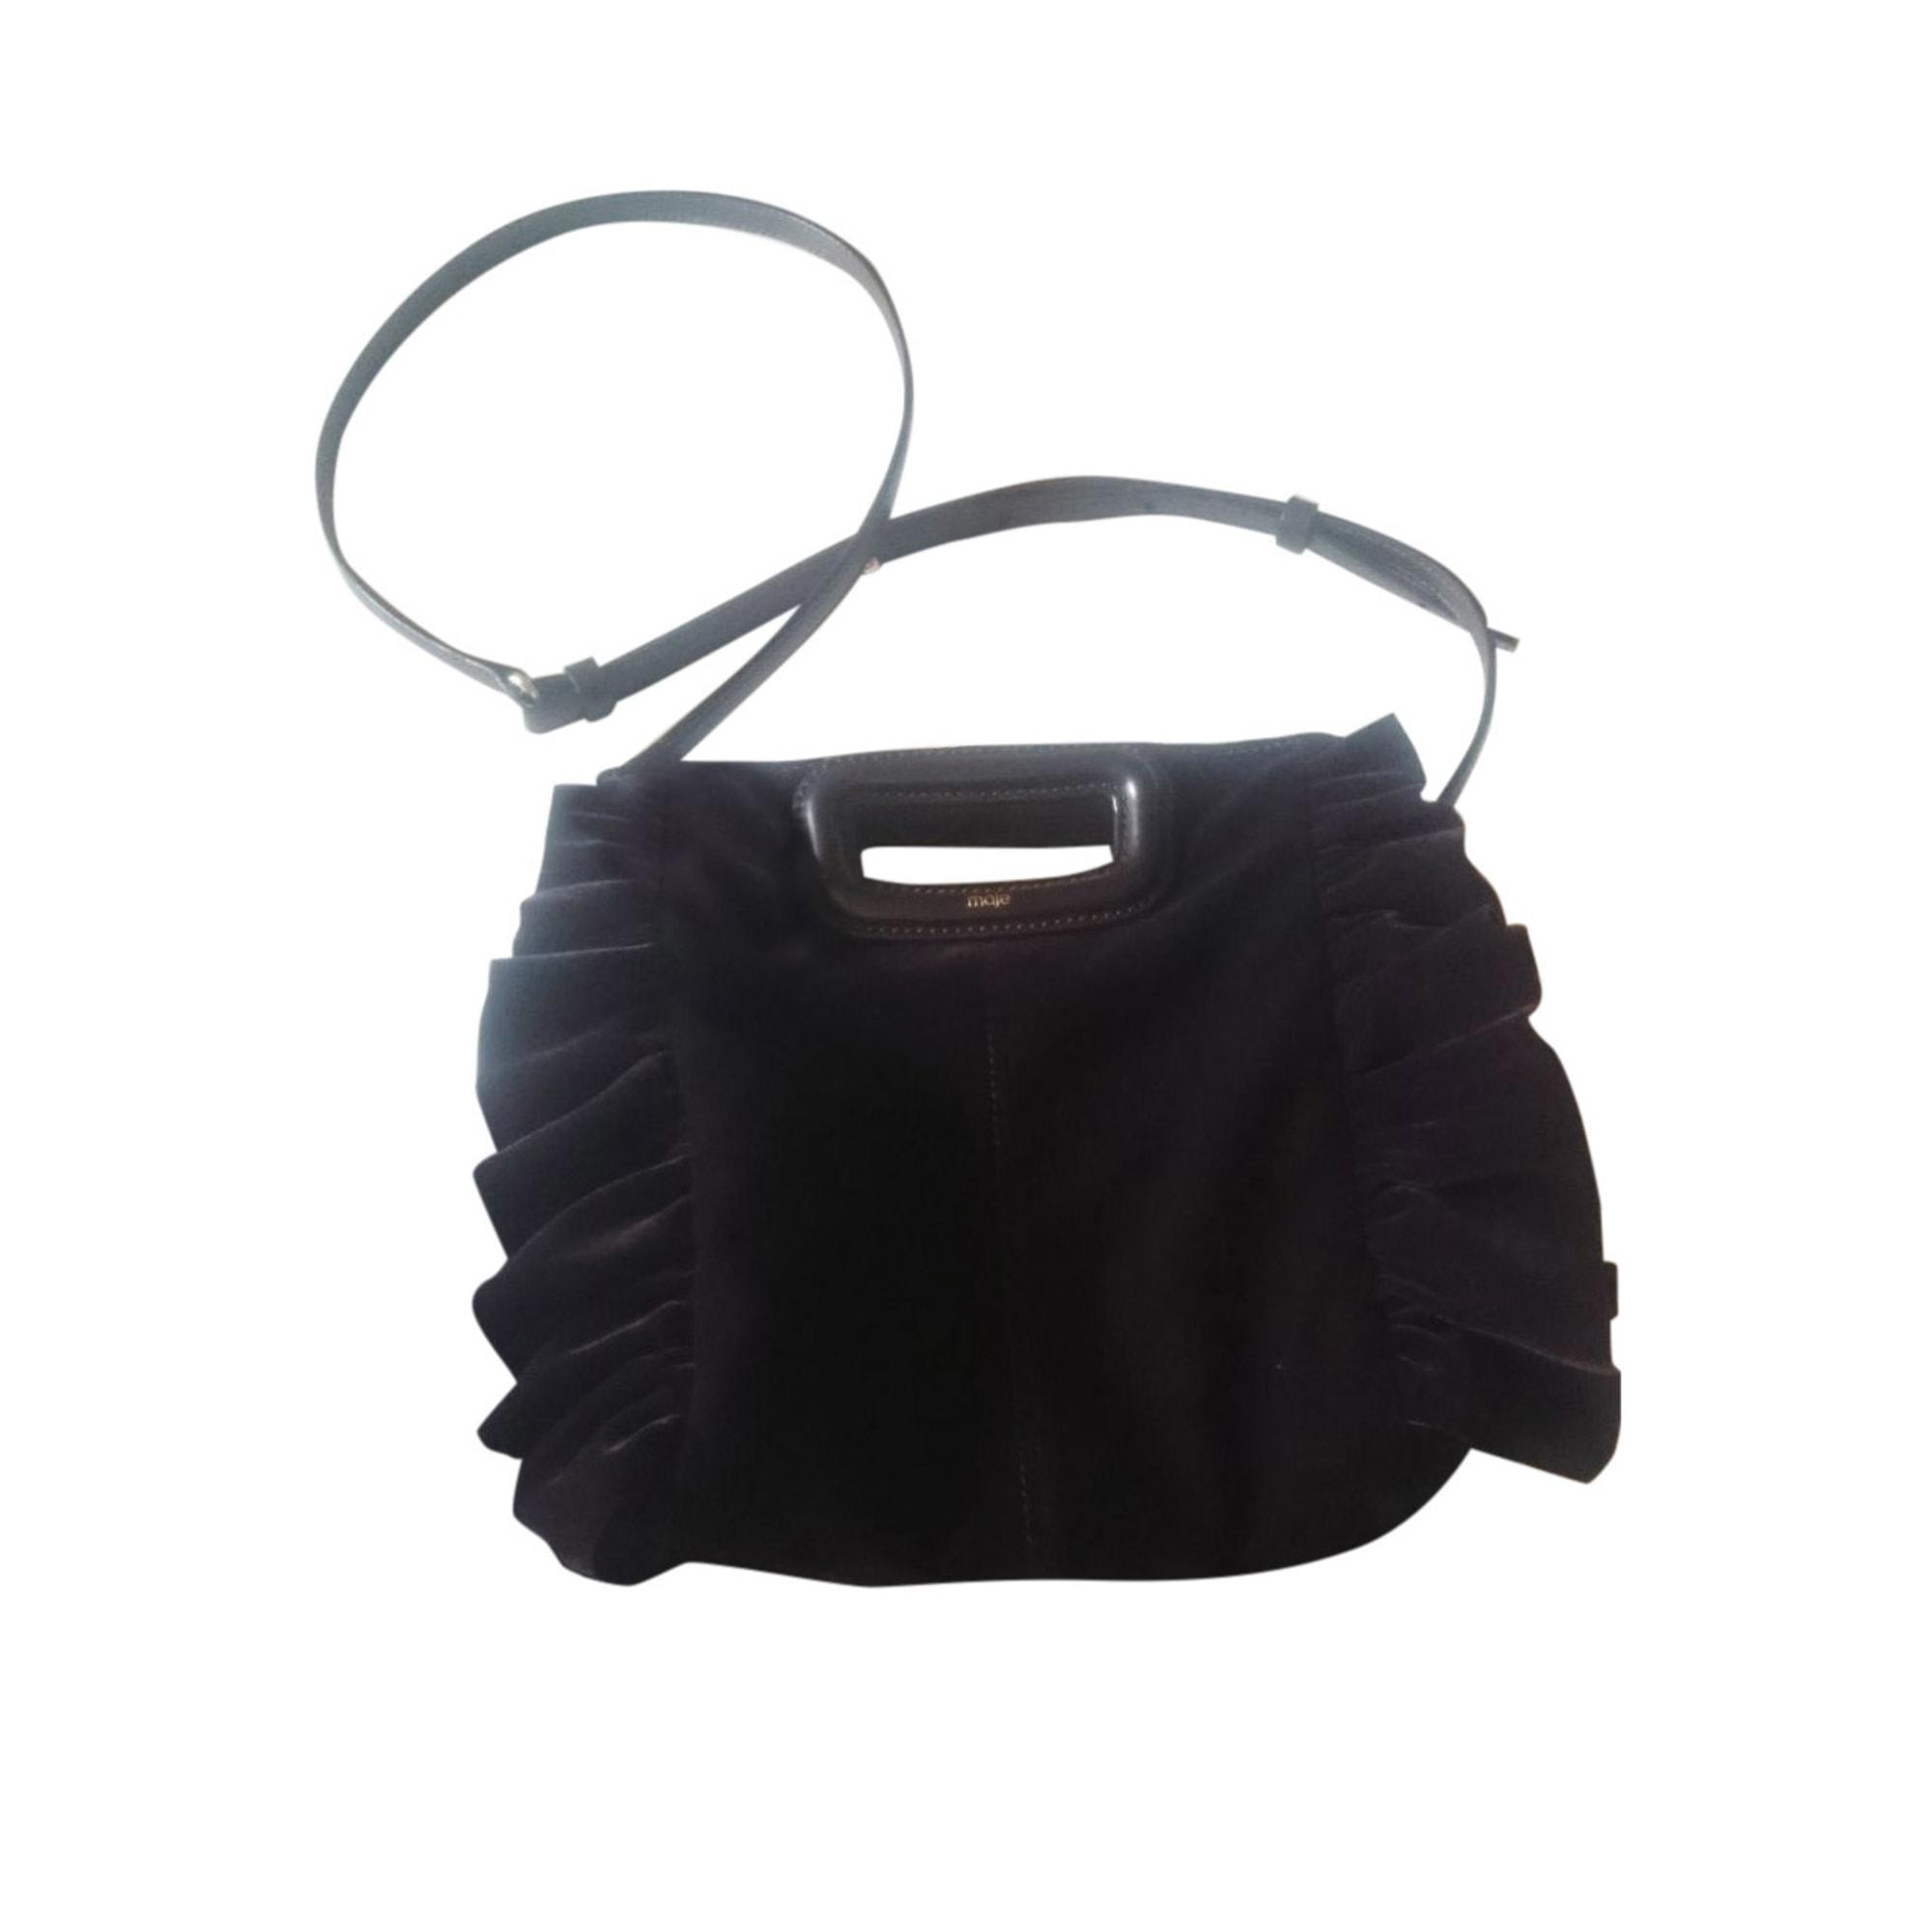 Leather Shoulder Bag MAJE Purple, mauve, lavender